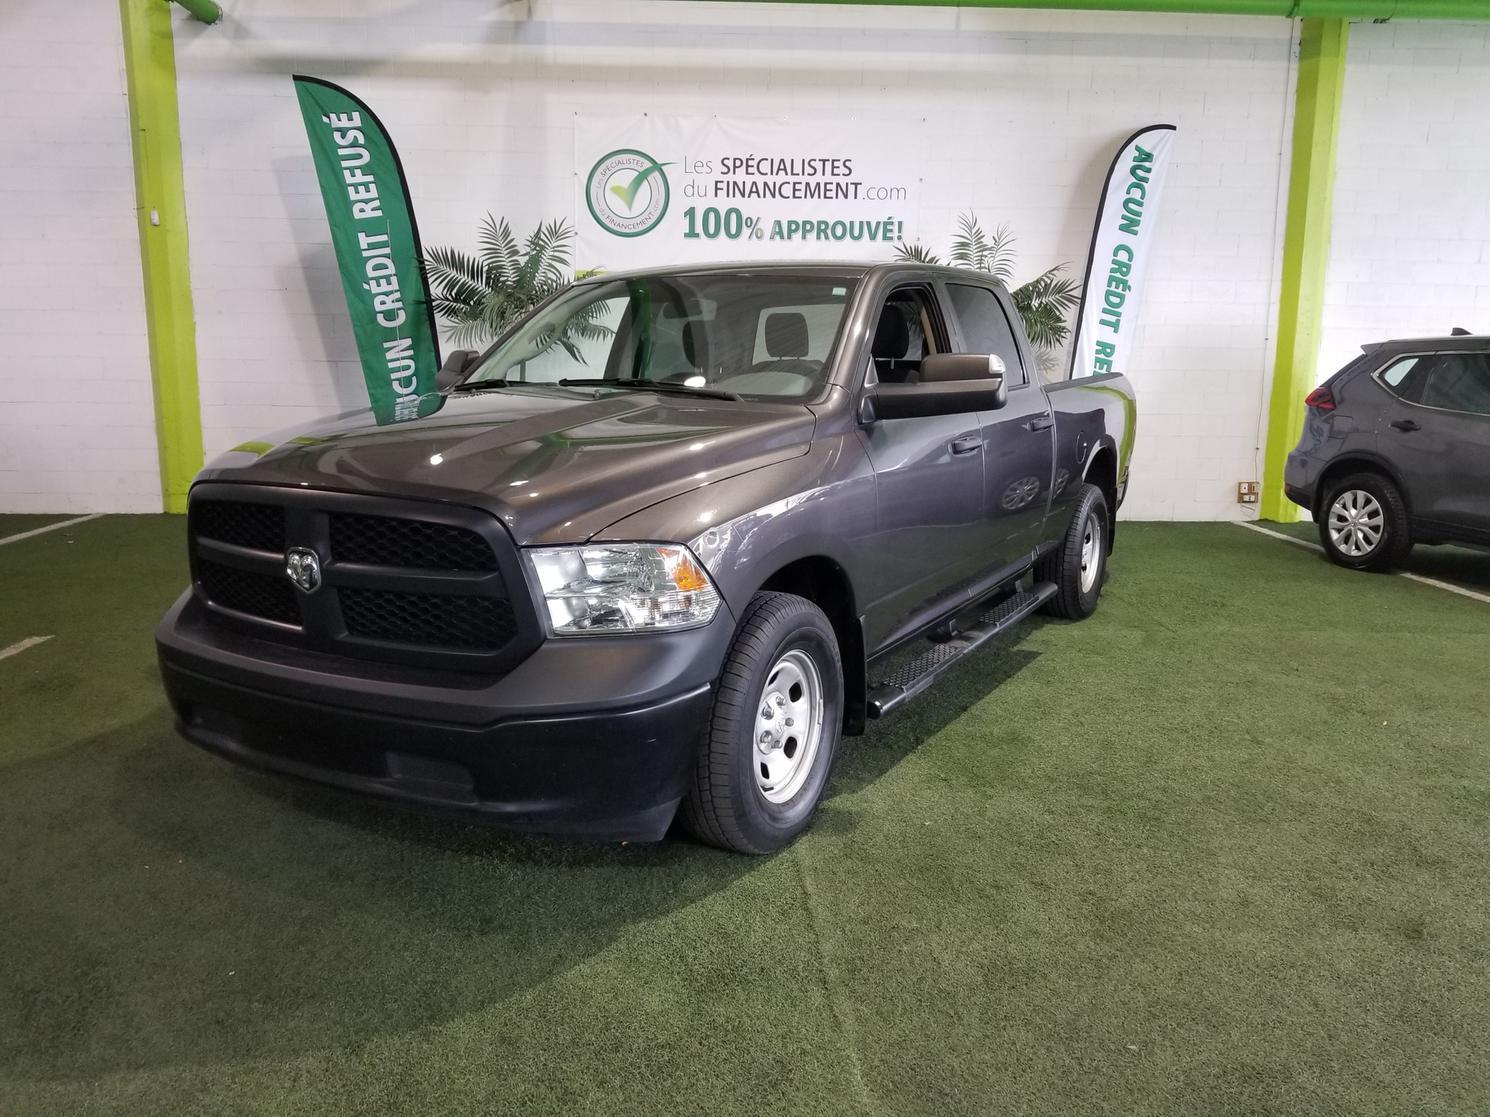 2018 Ram 1500 Ecodiesel Tradesman 4×4